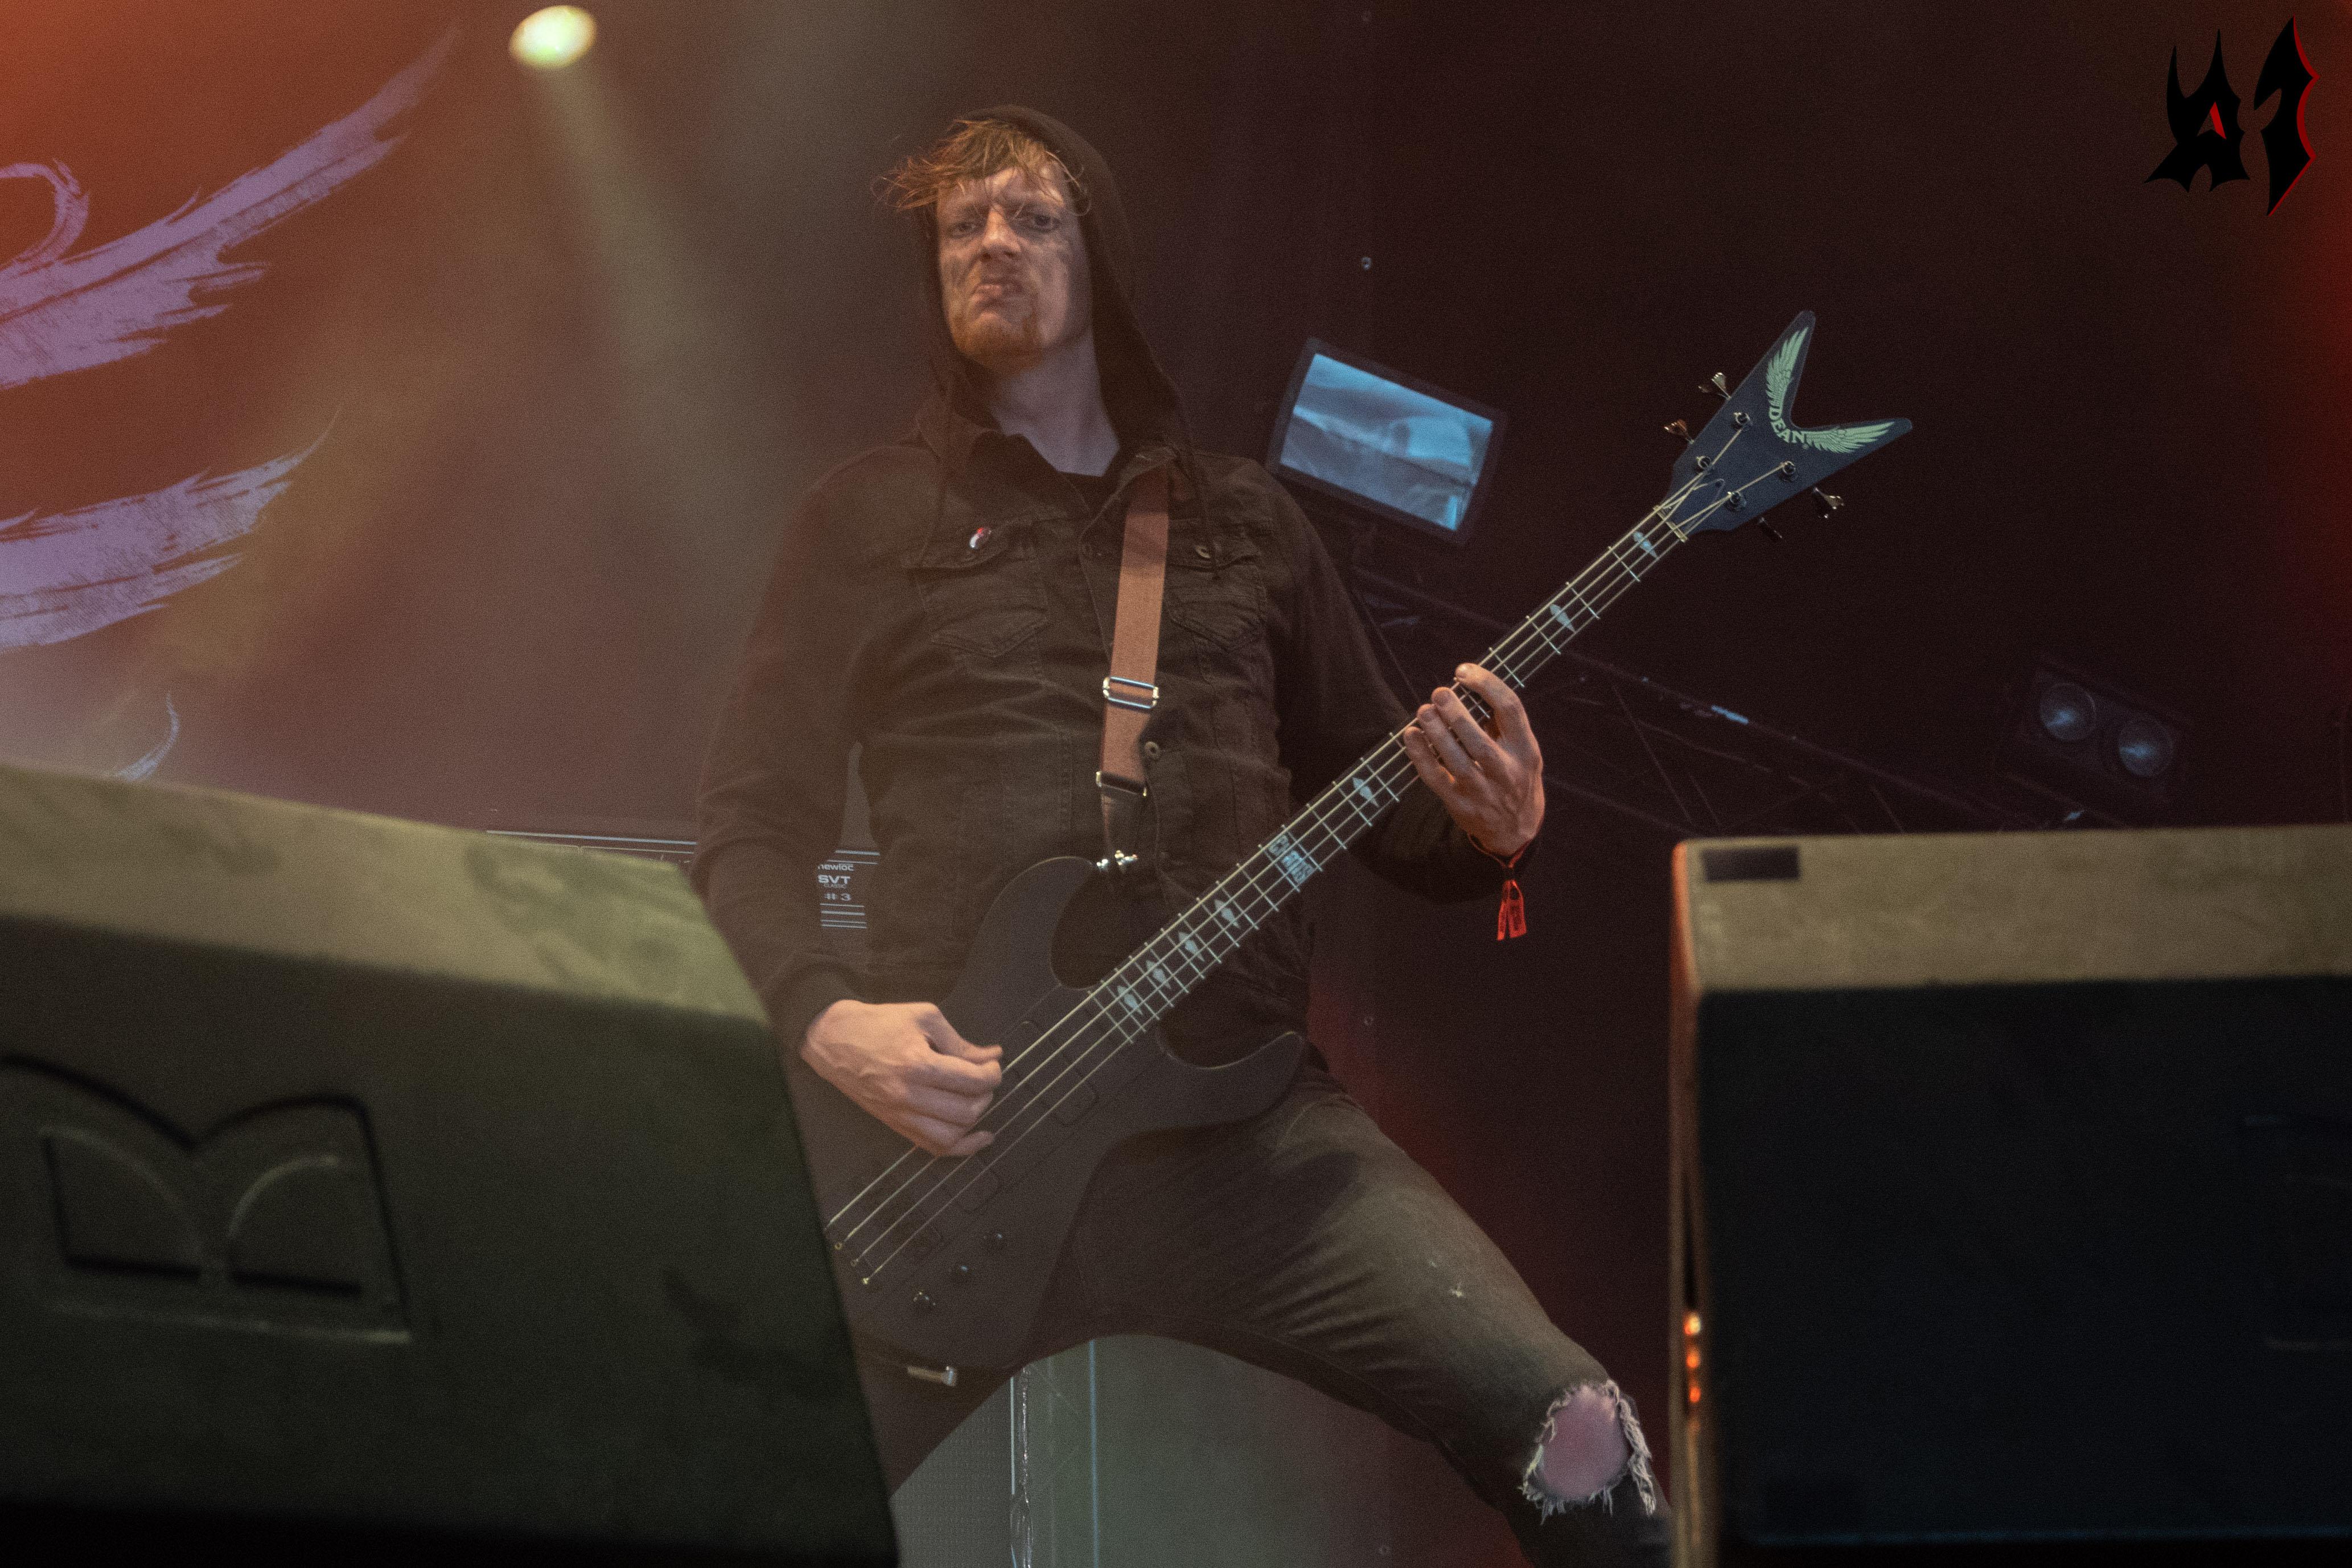 Hellfest - Vltimas - 11